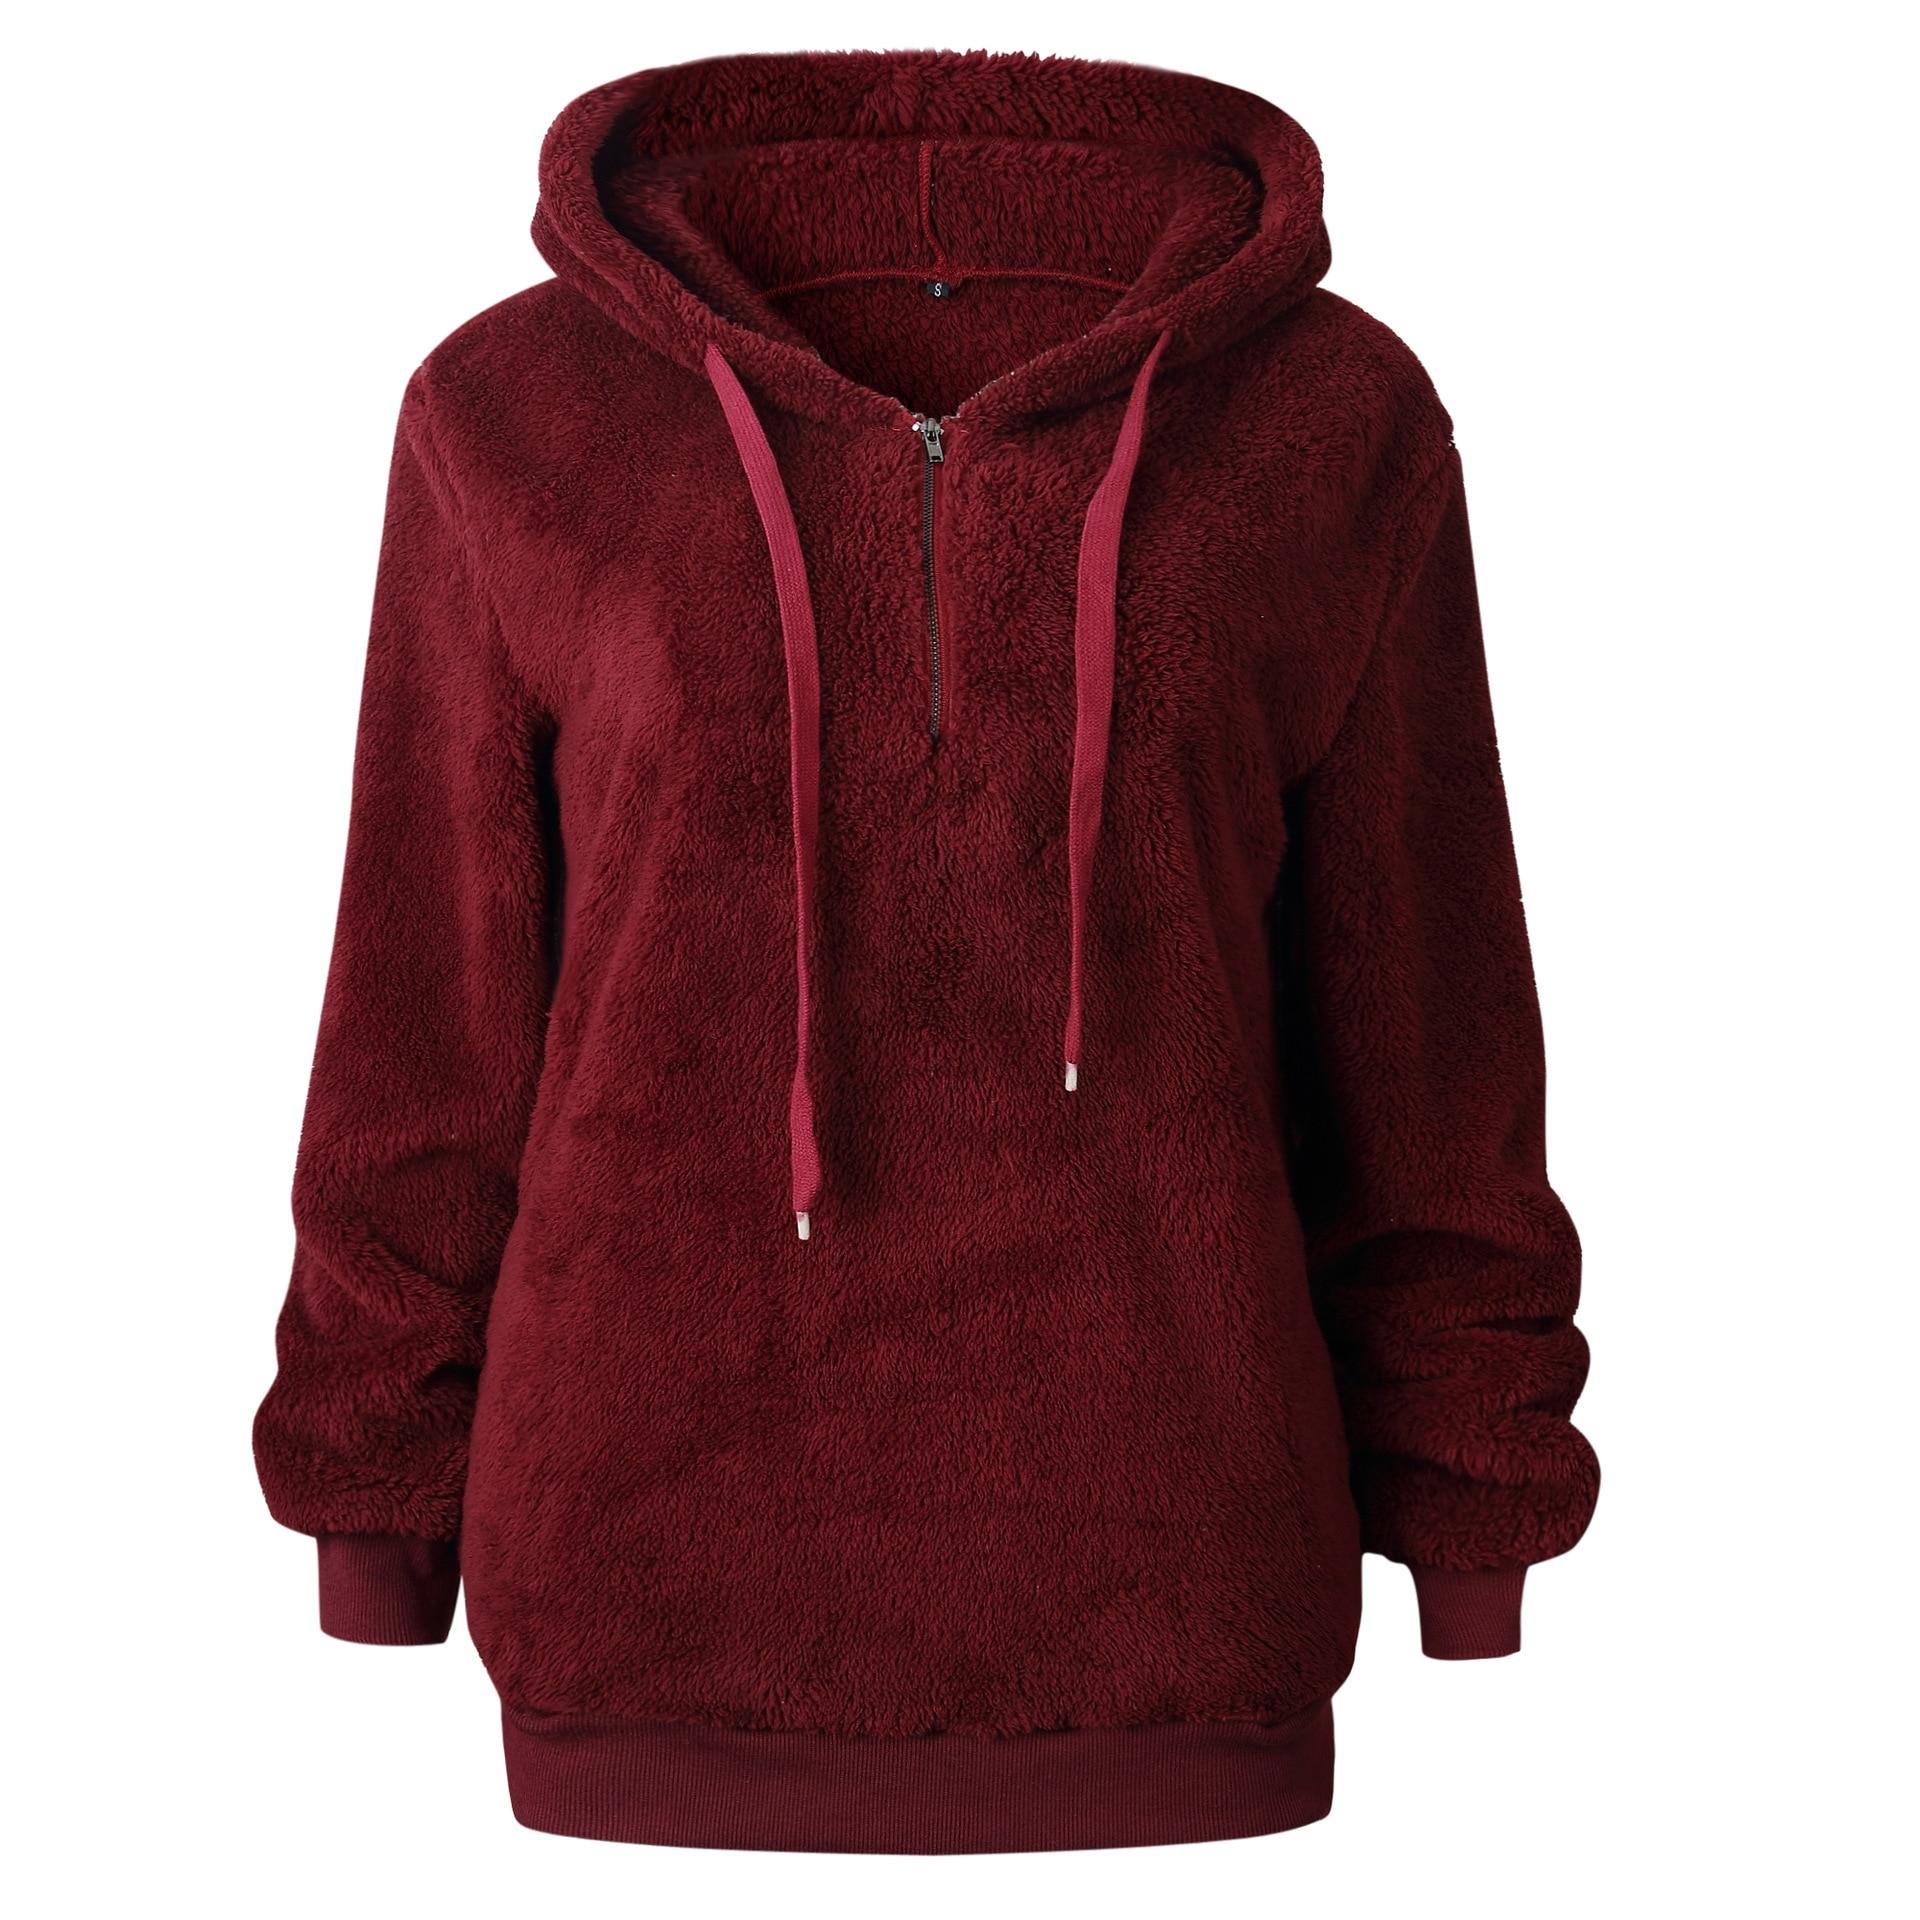 2019 Autumn Female Pullover Women Hoodies Solid Loose Drawstring Sweatshirt Long Sleeve Red